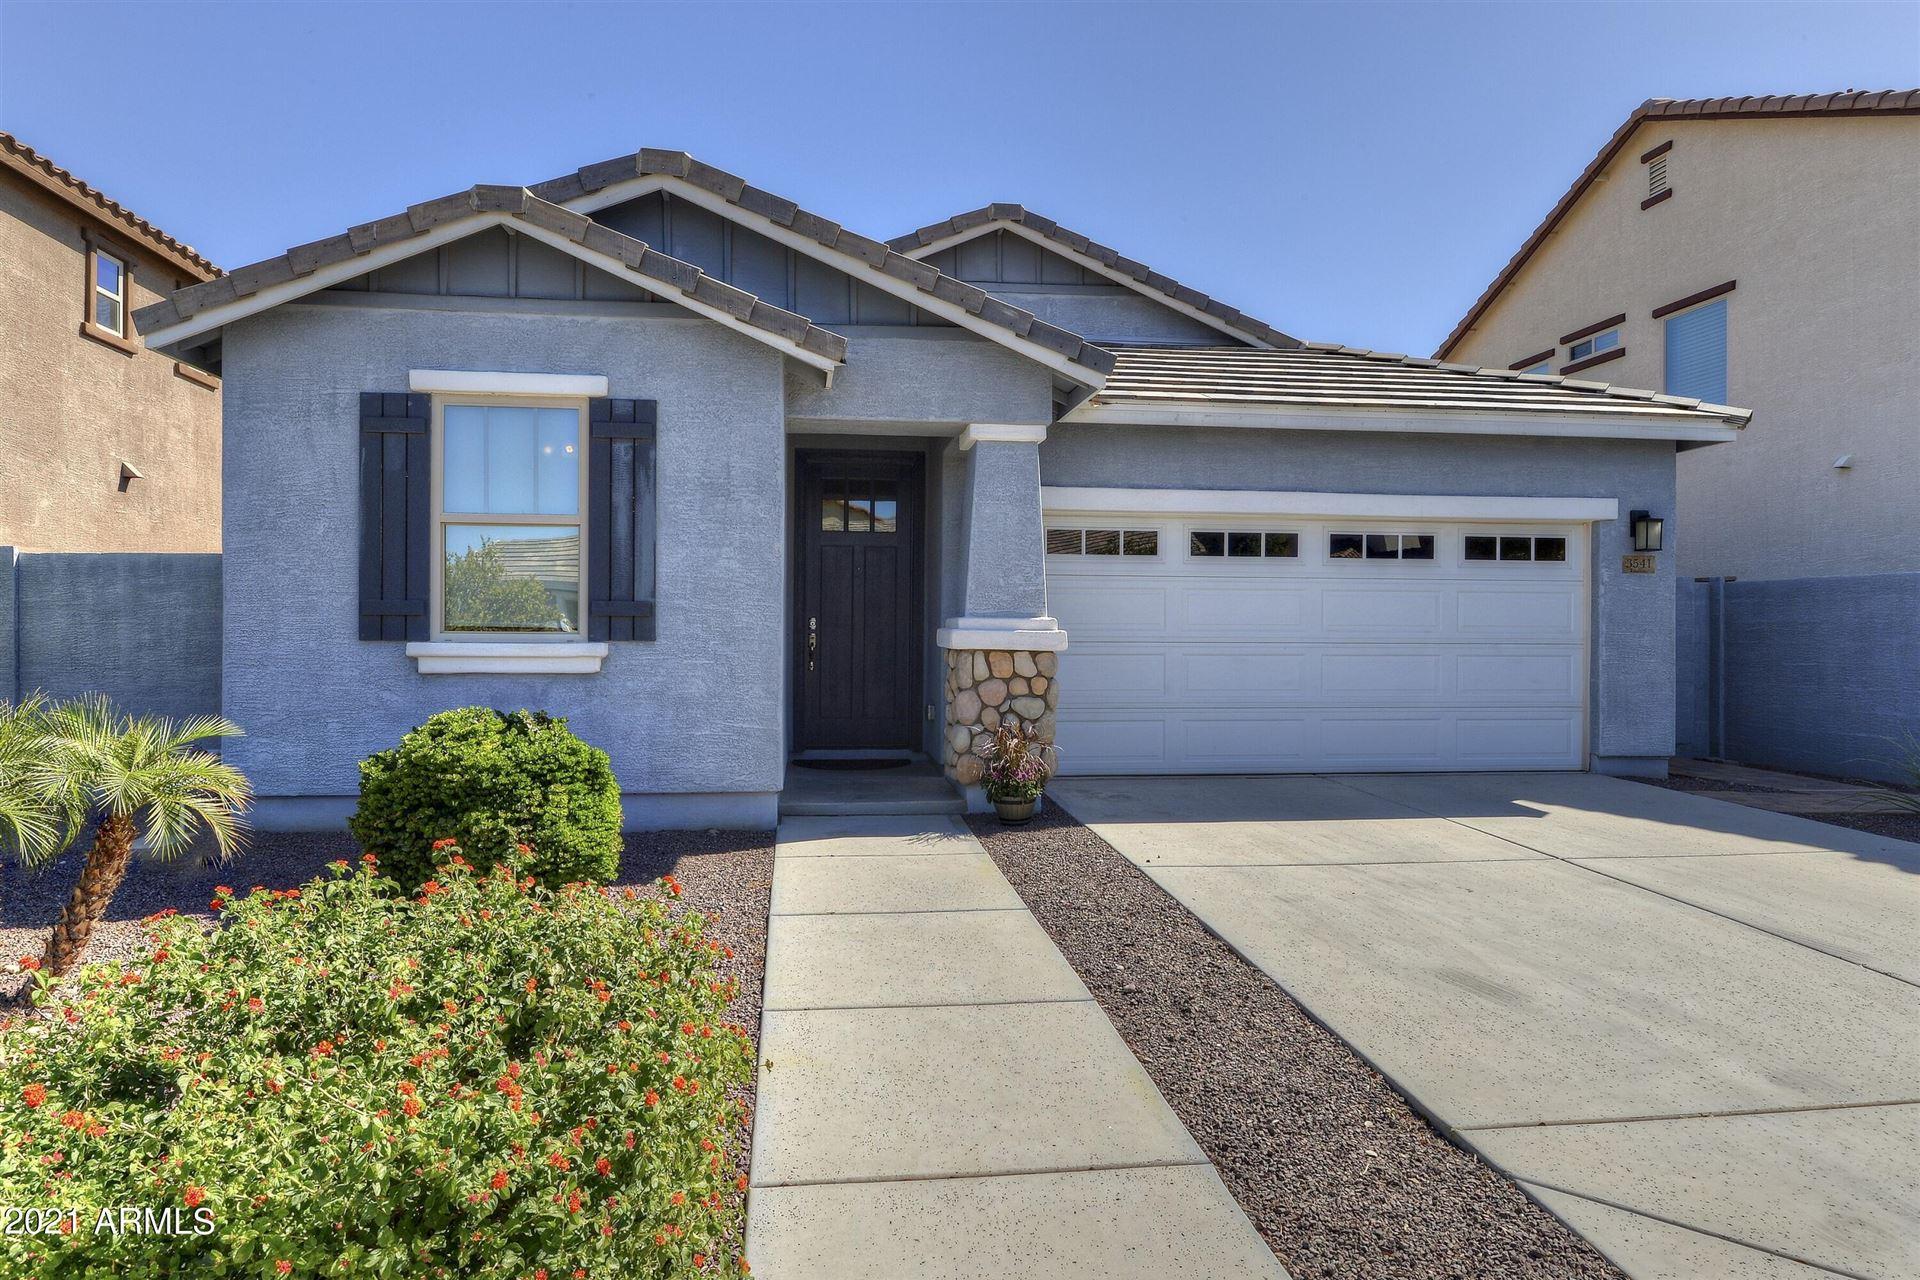 Photo of 3541 N 34TH Street, Mesa, AZ 85213 (MLS # 6307900)